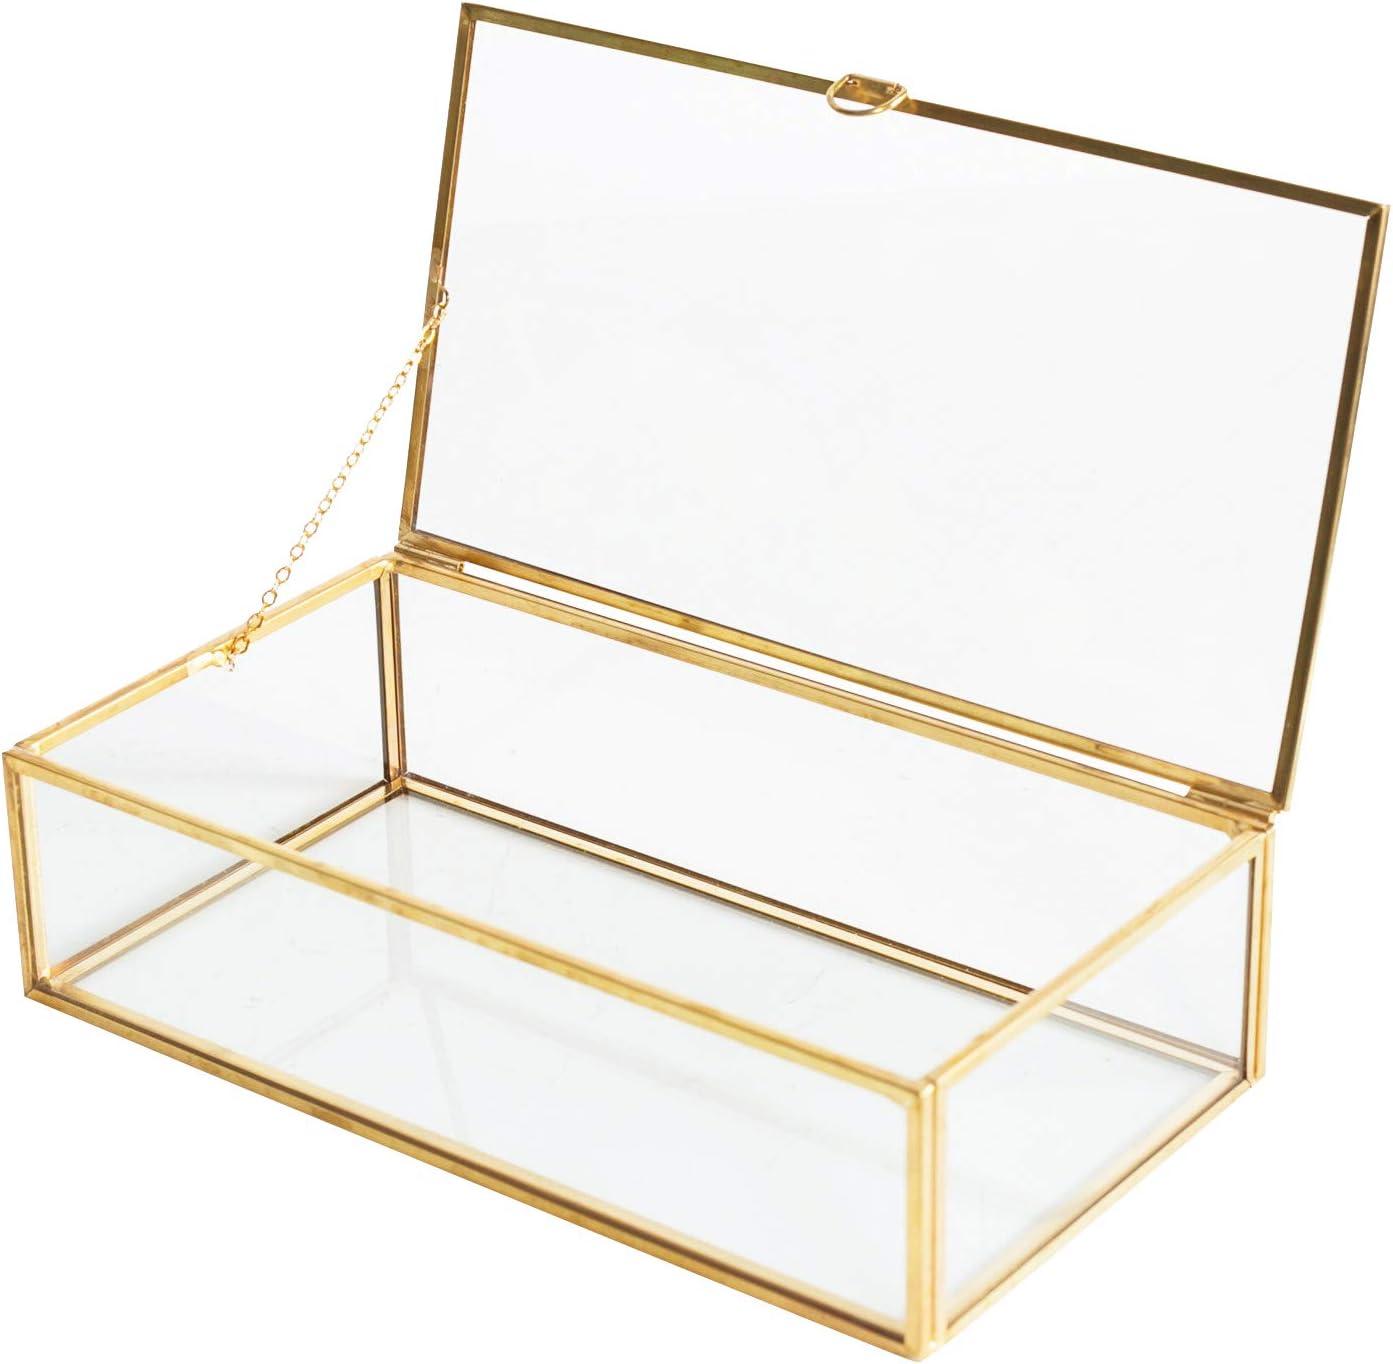 Golden Vintage Glass Lidded Box Edge Bracelet Keepsake Decorative Jewelry Display Personalized Large Clear Rectangle Box Rings Bracelet Golden Organizer Home Decor 8x4 5x2in Home Kitchen